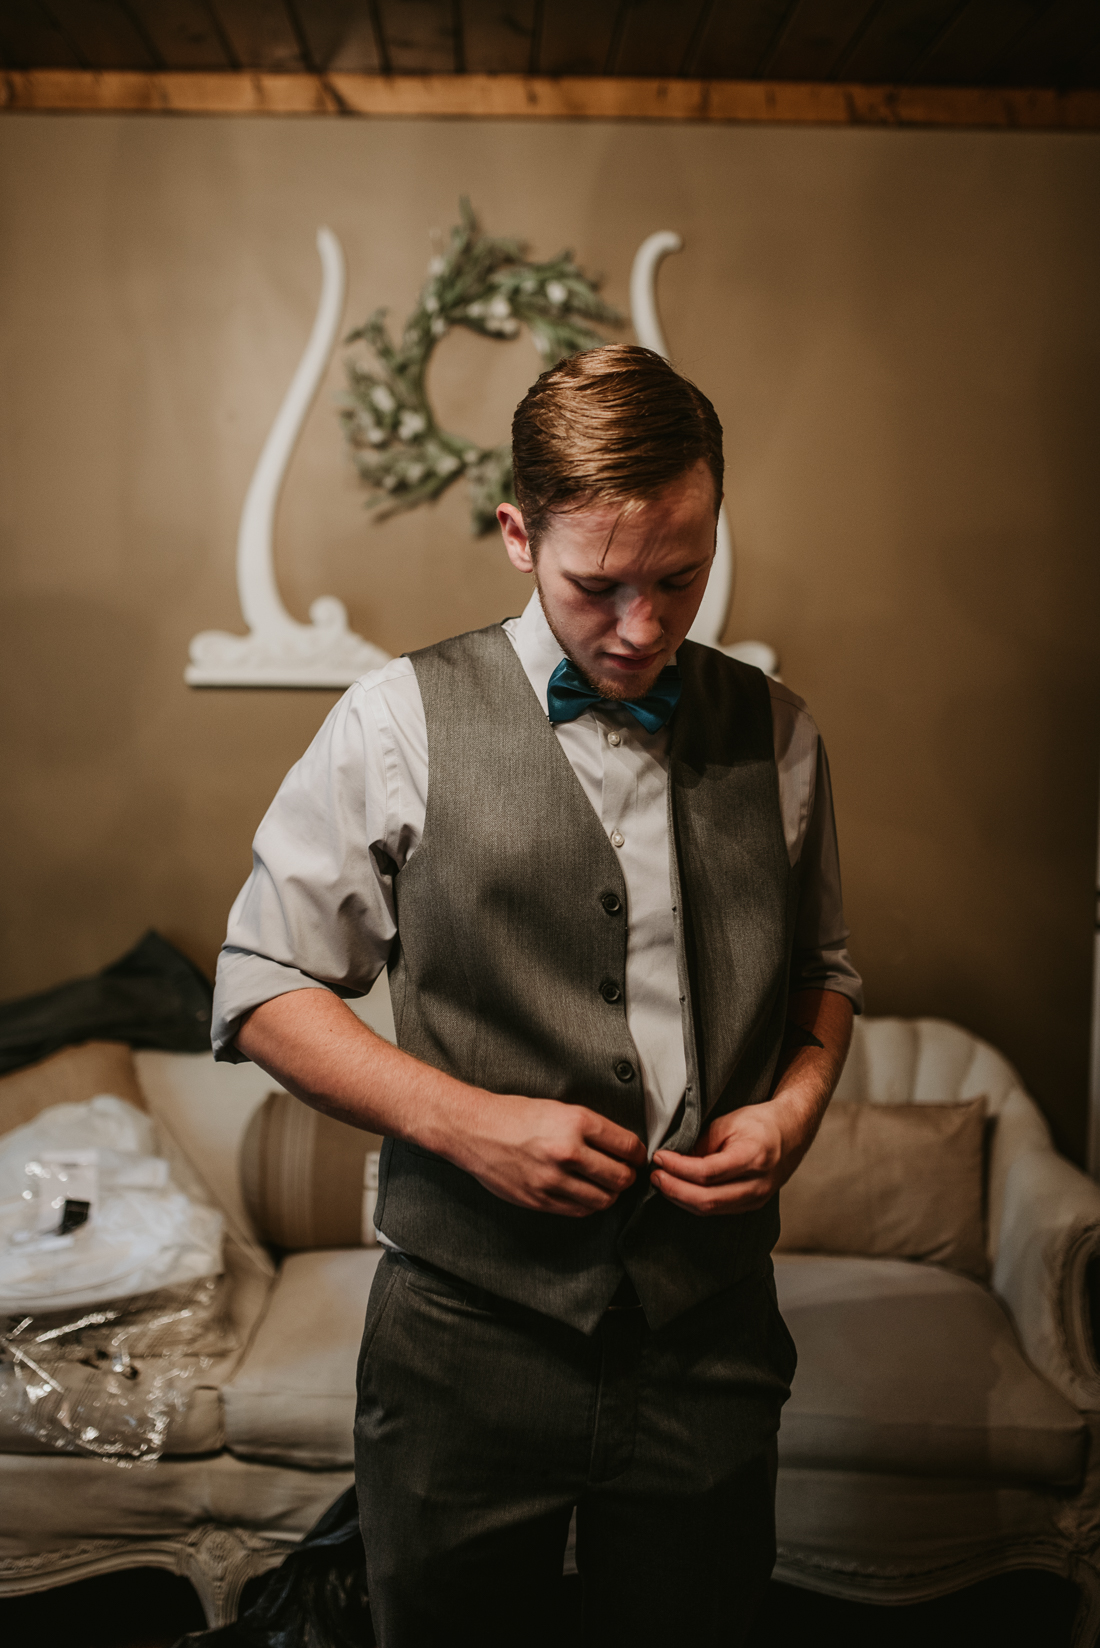 olivia_zay_wedding_09_2018-0538.jpg